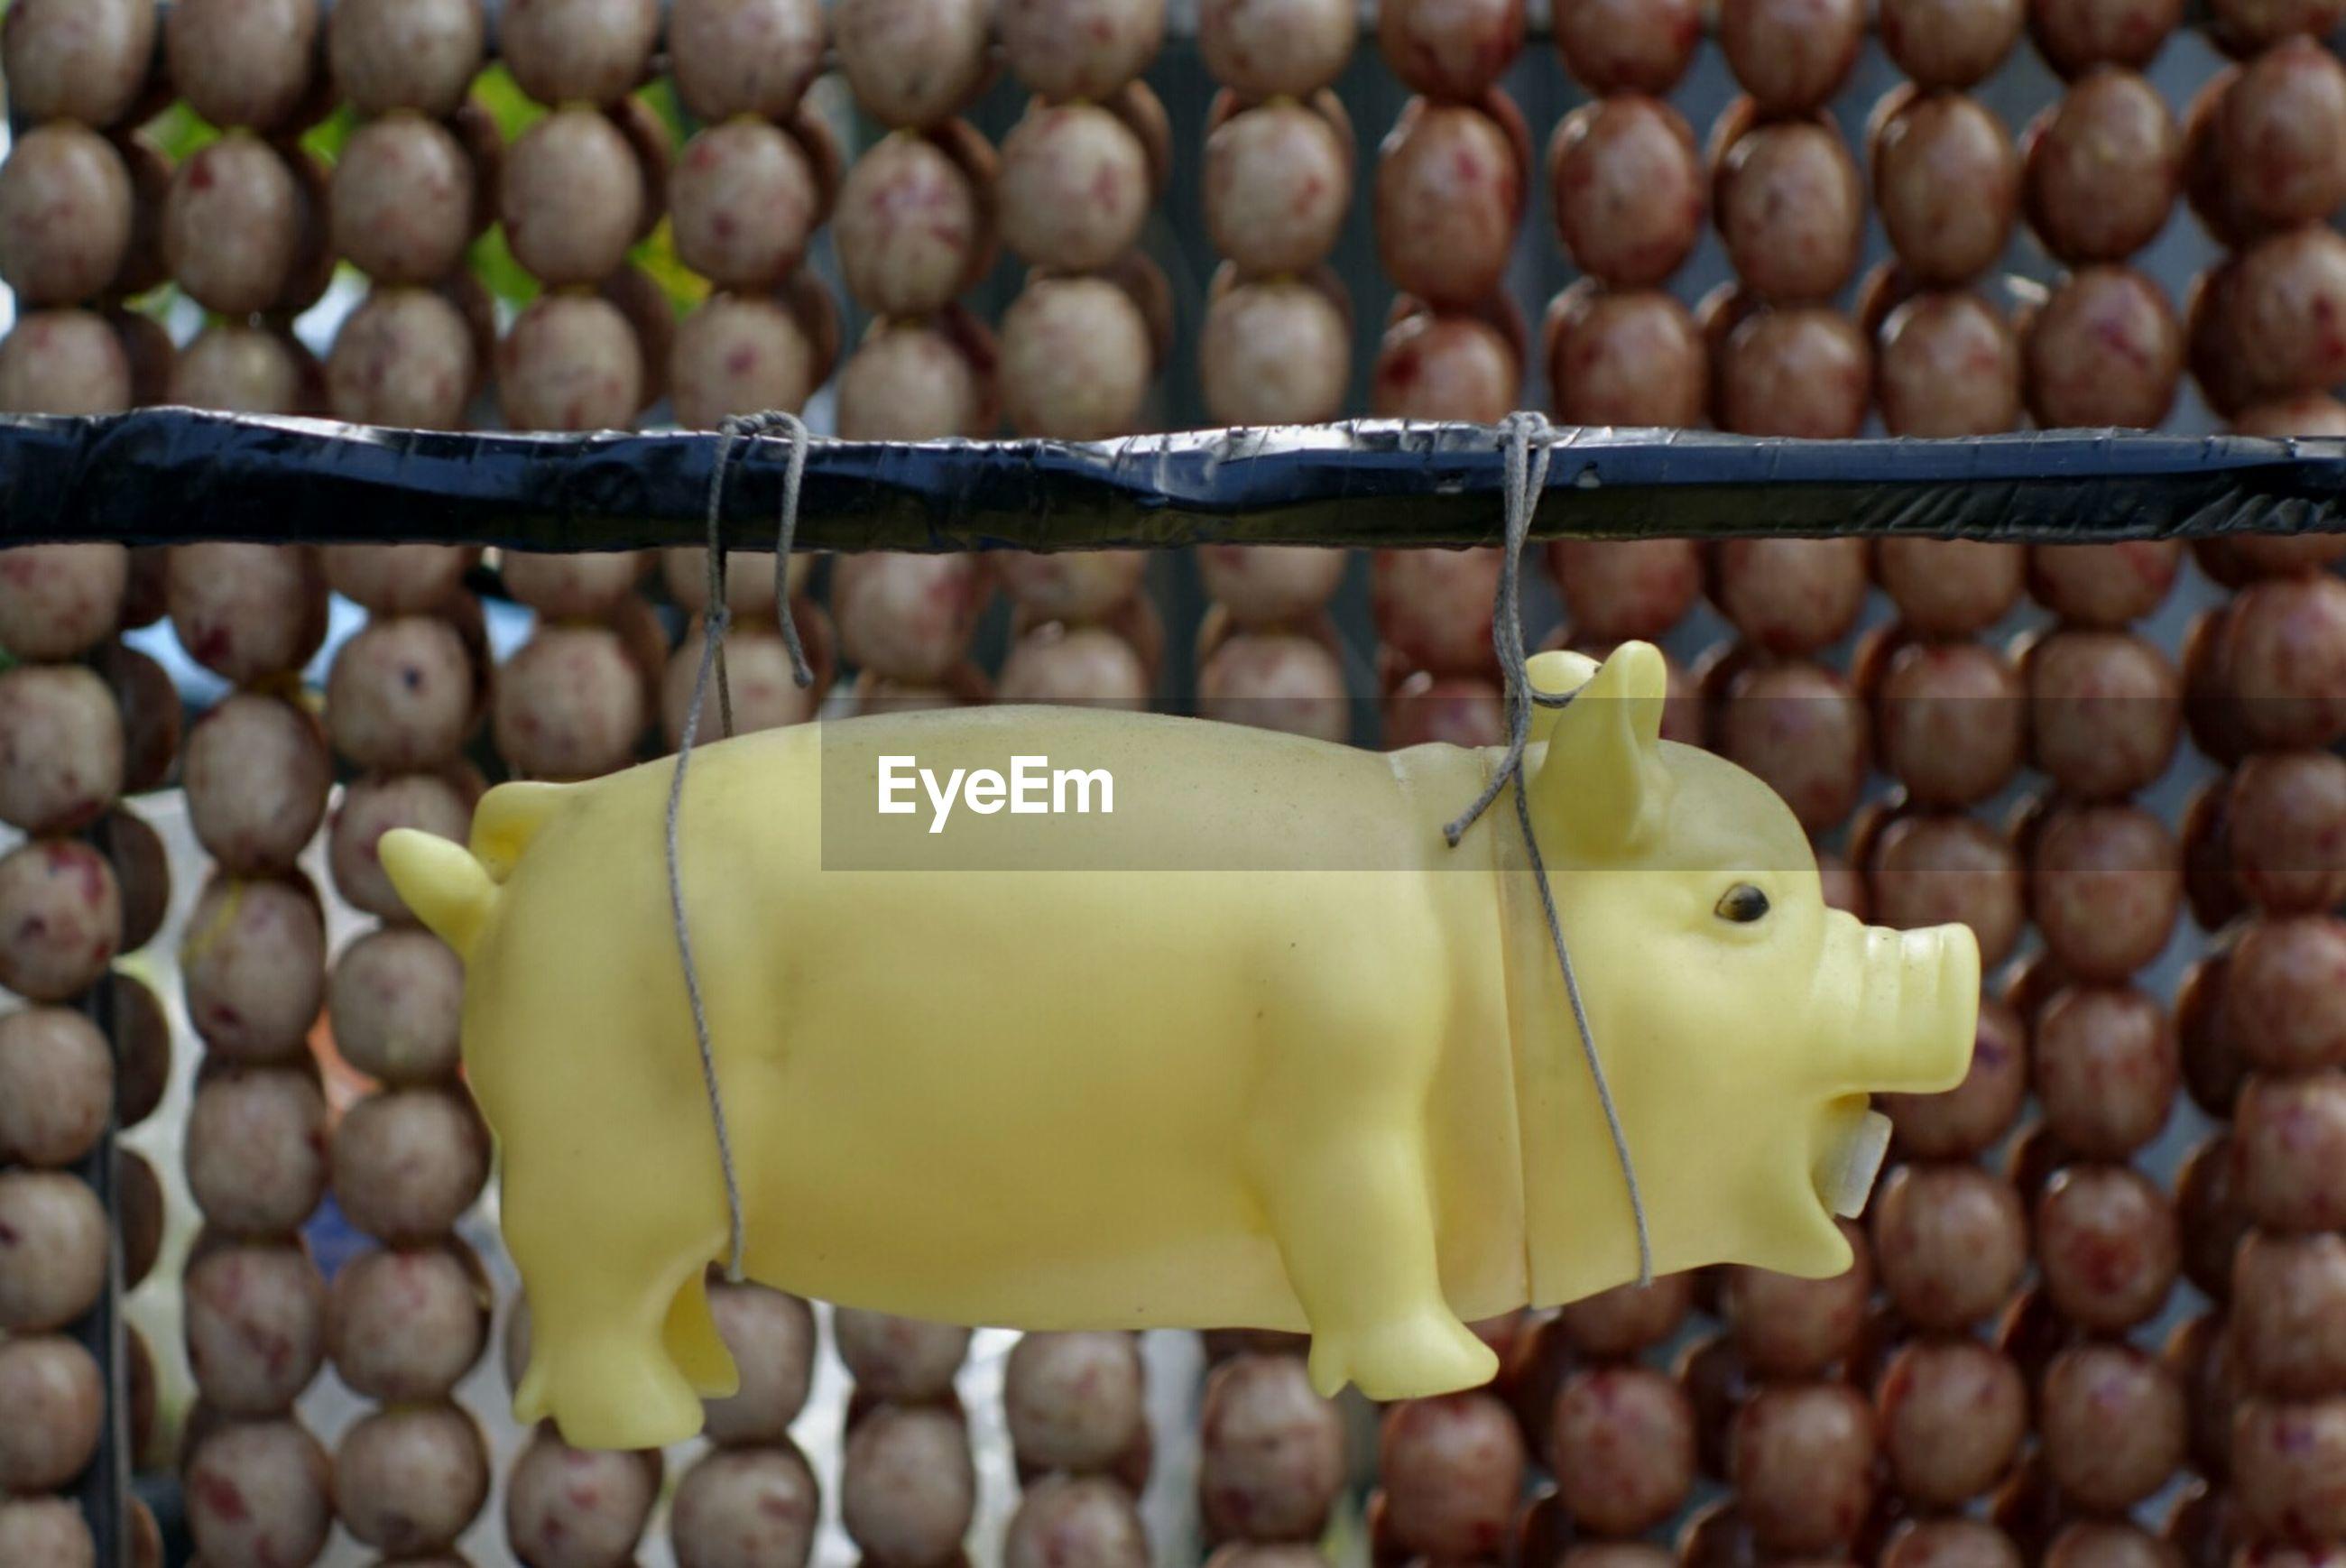 Close-up of toy pig hanging against pork balls at market for sale